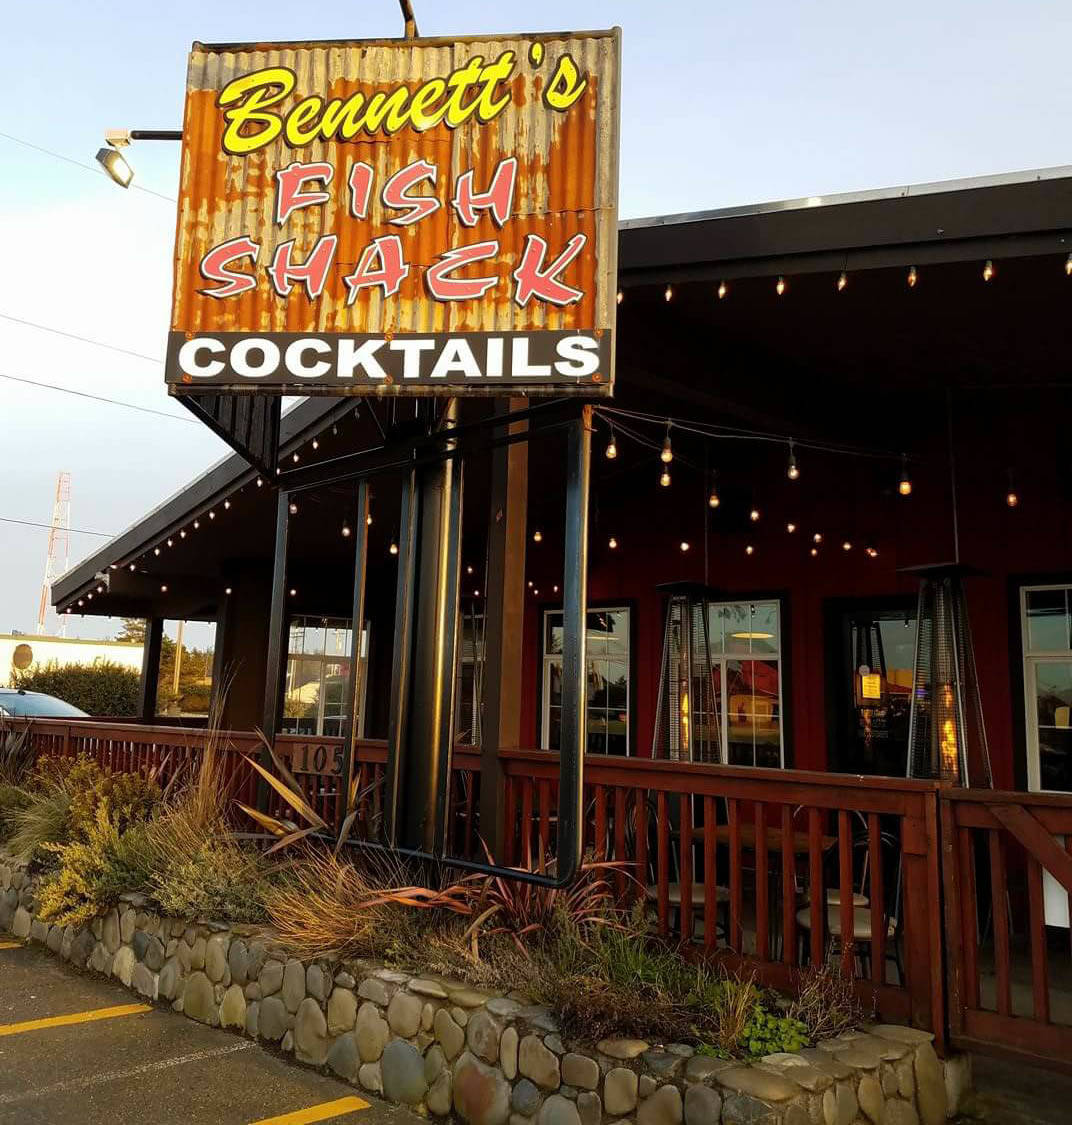 Bennetts fish shack